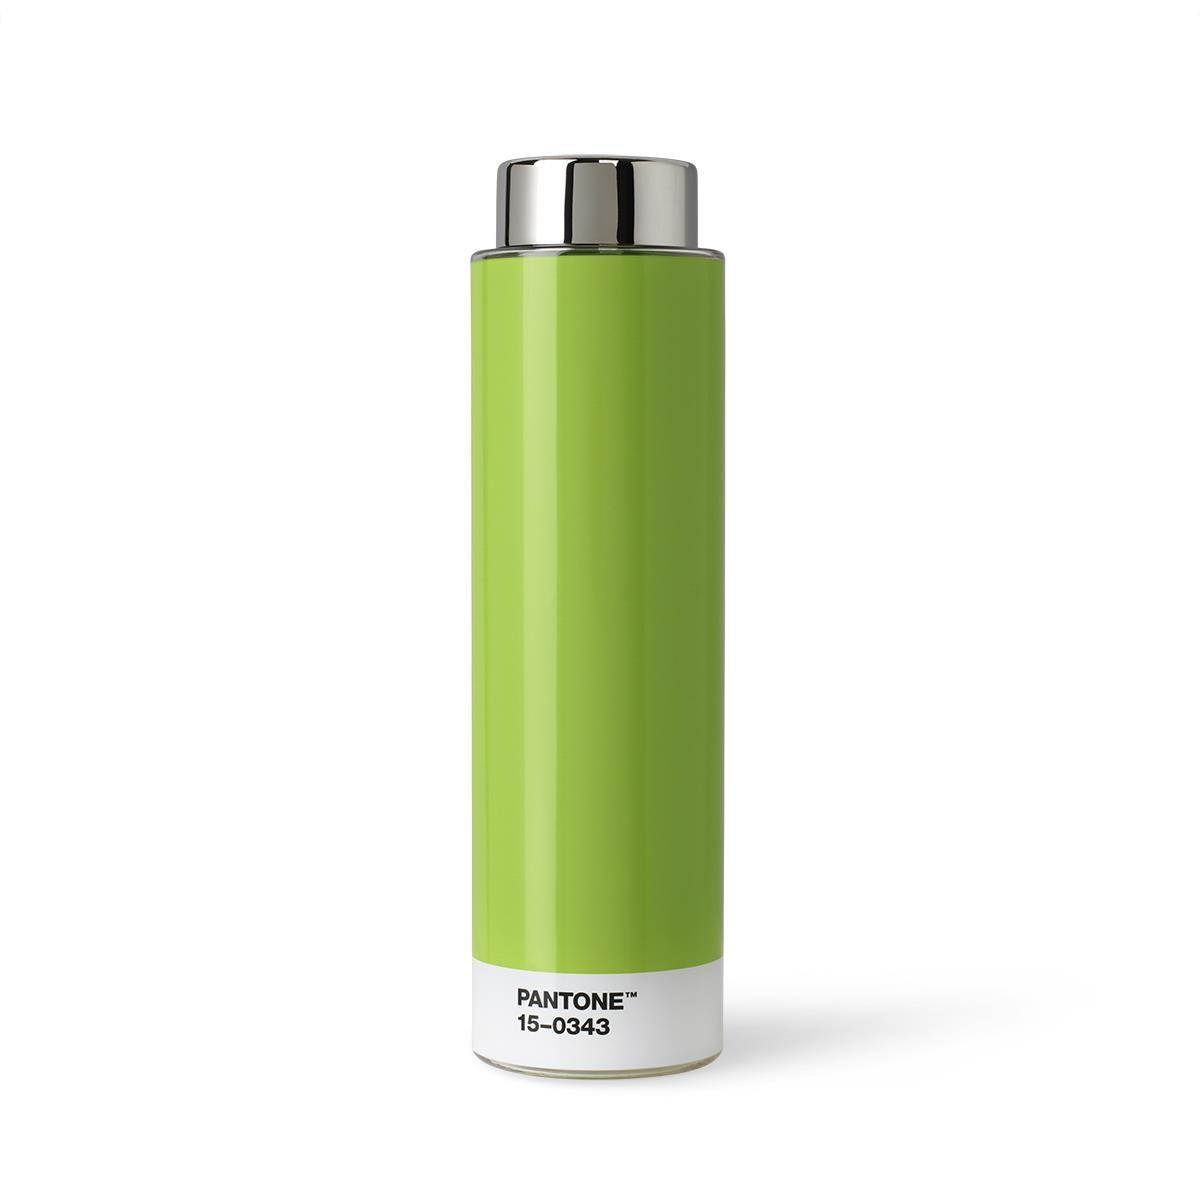 Borraccia Tritan - 500 ml - Acciaio Inossidabile - Verde 15-0343 - Set da 6 Pezzi